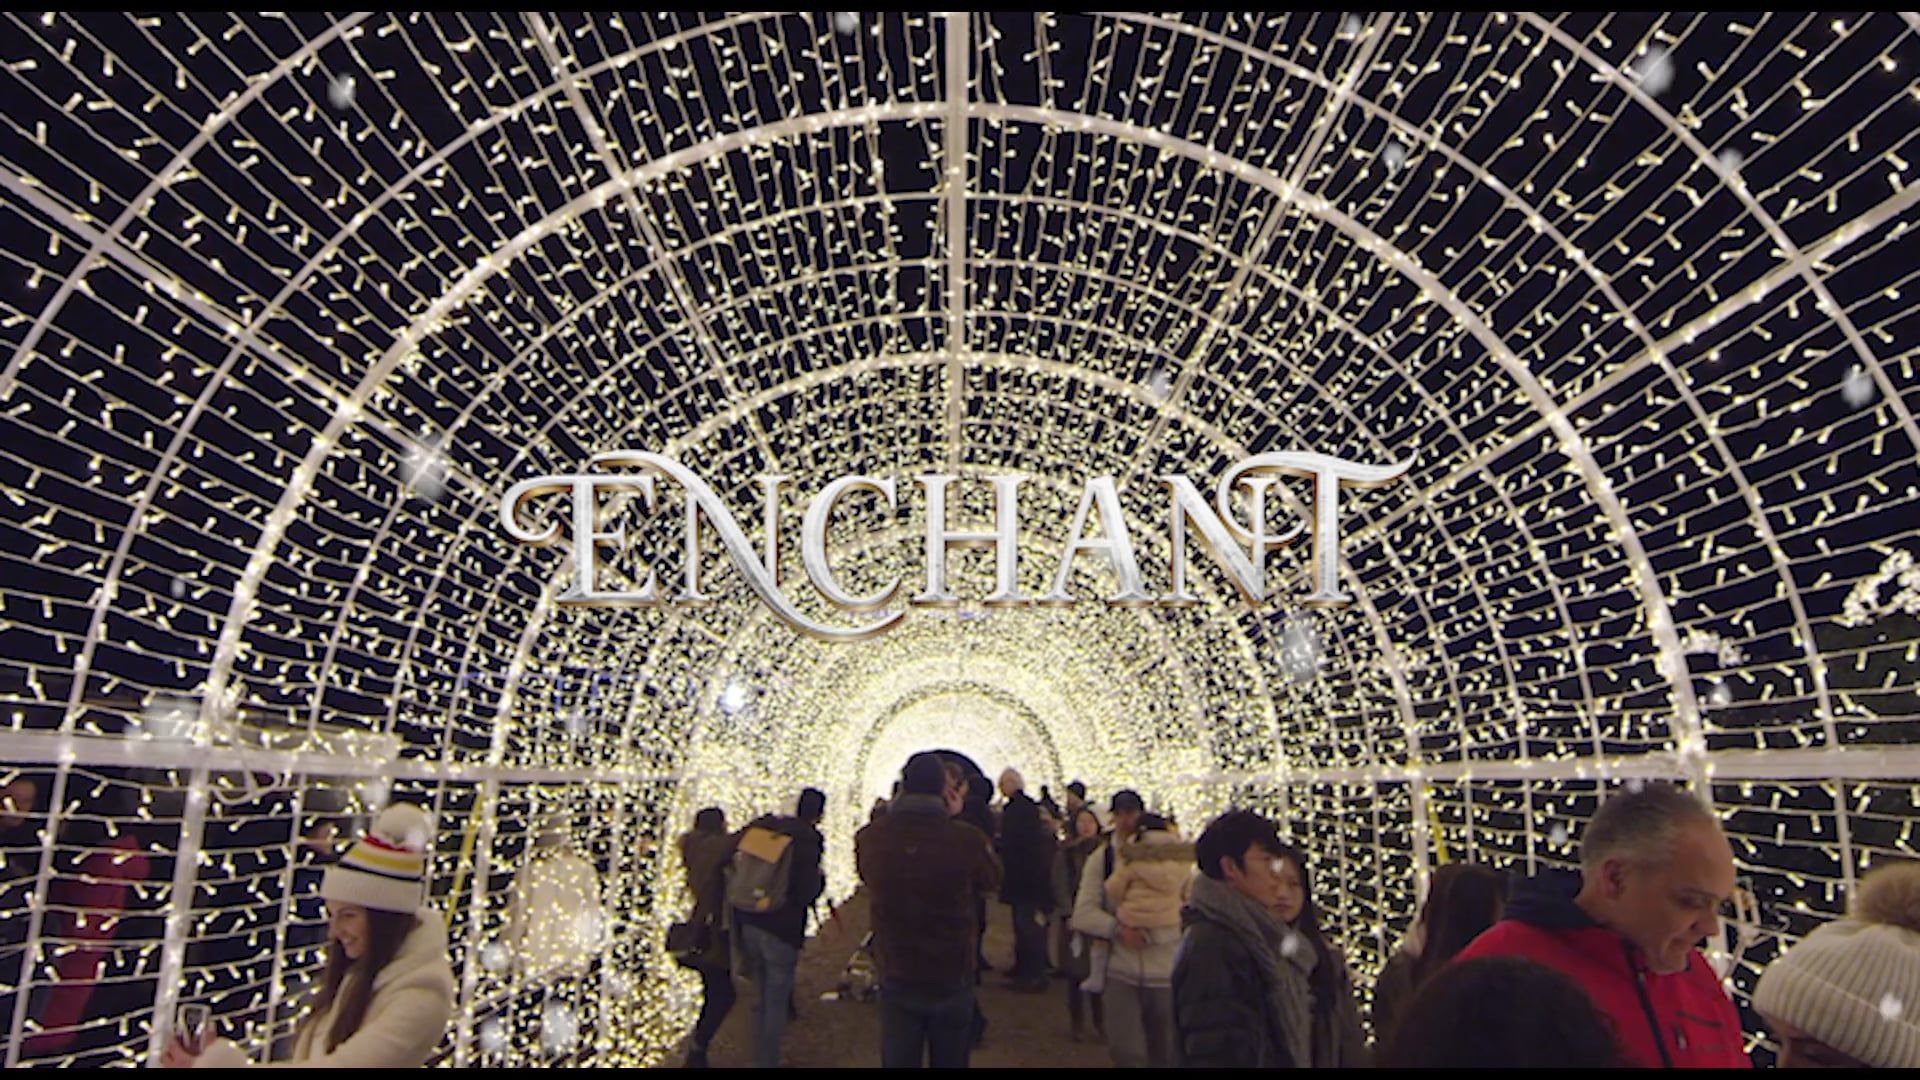 Enchant The World S Largest Christmas Light Maze Market Best Friend Bucket List Christmas Lights Travel Dreams